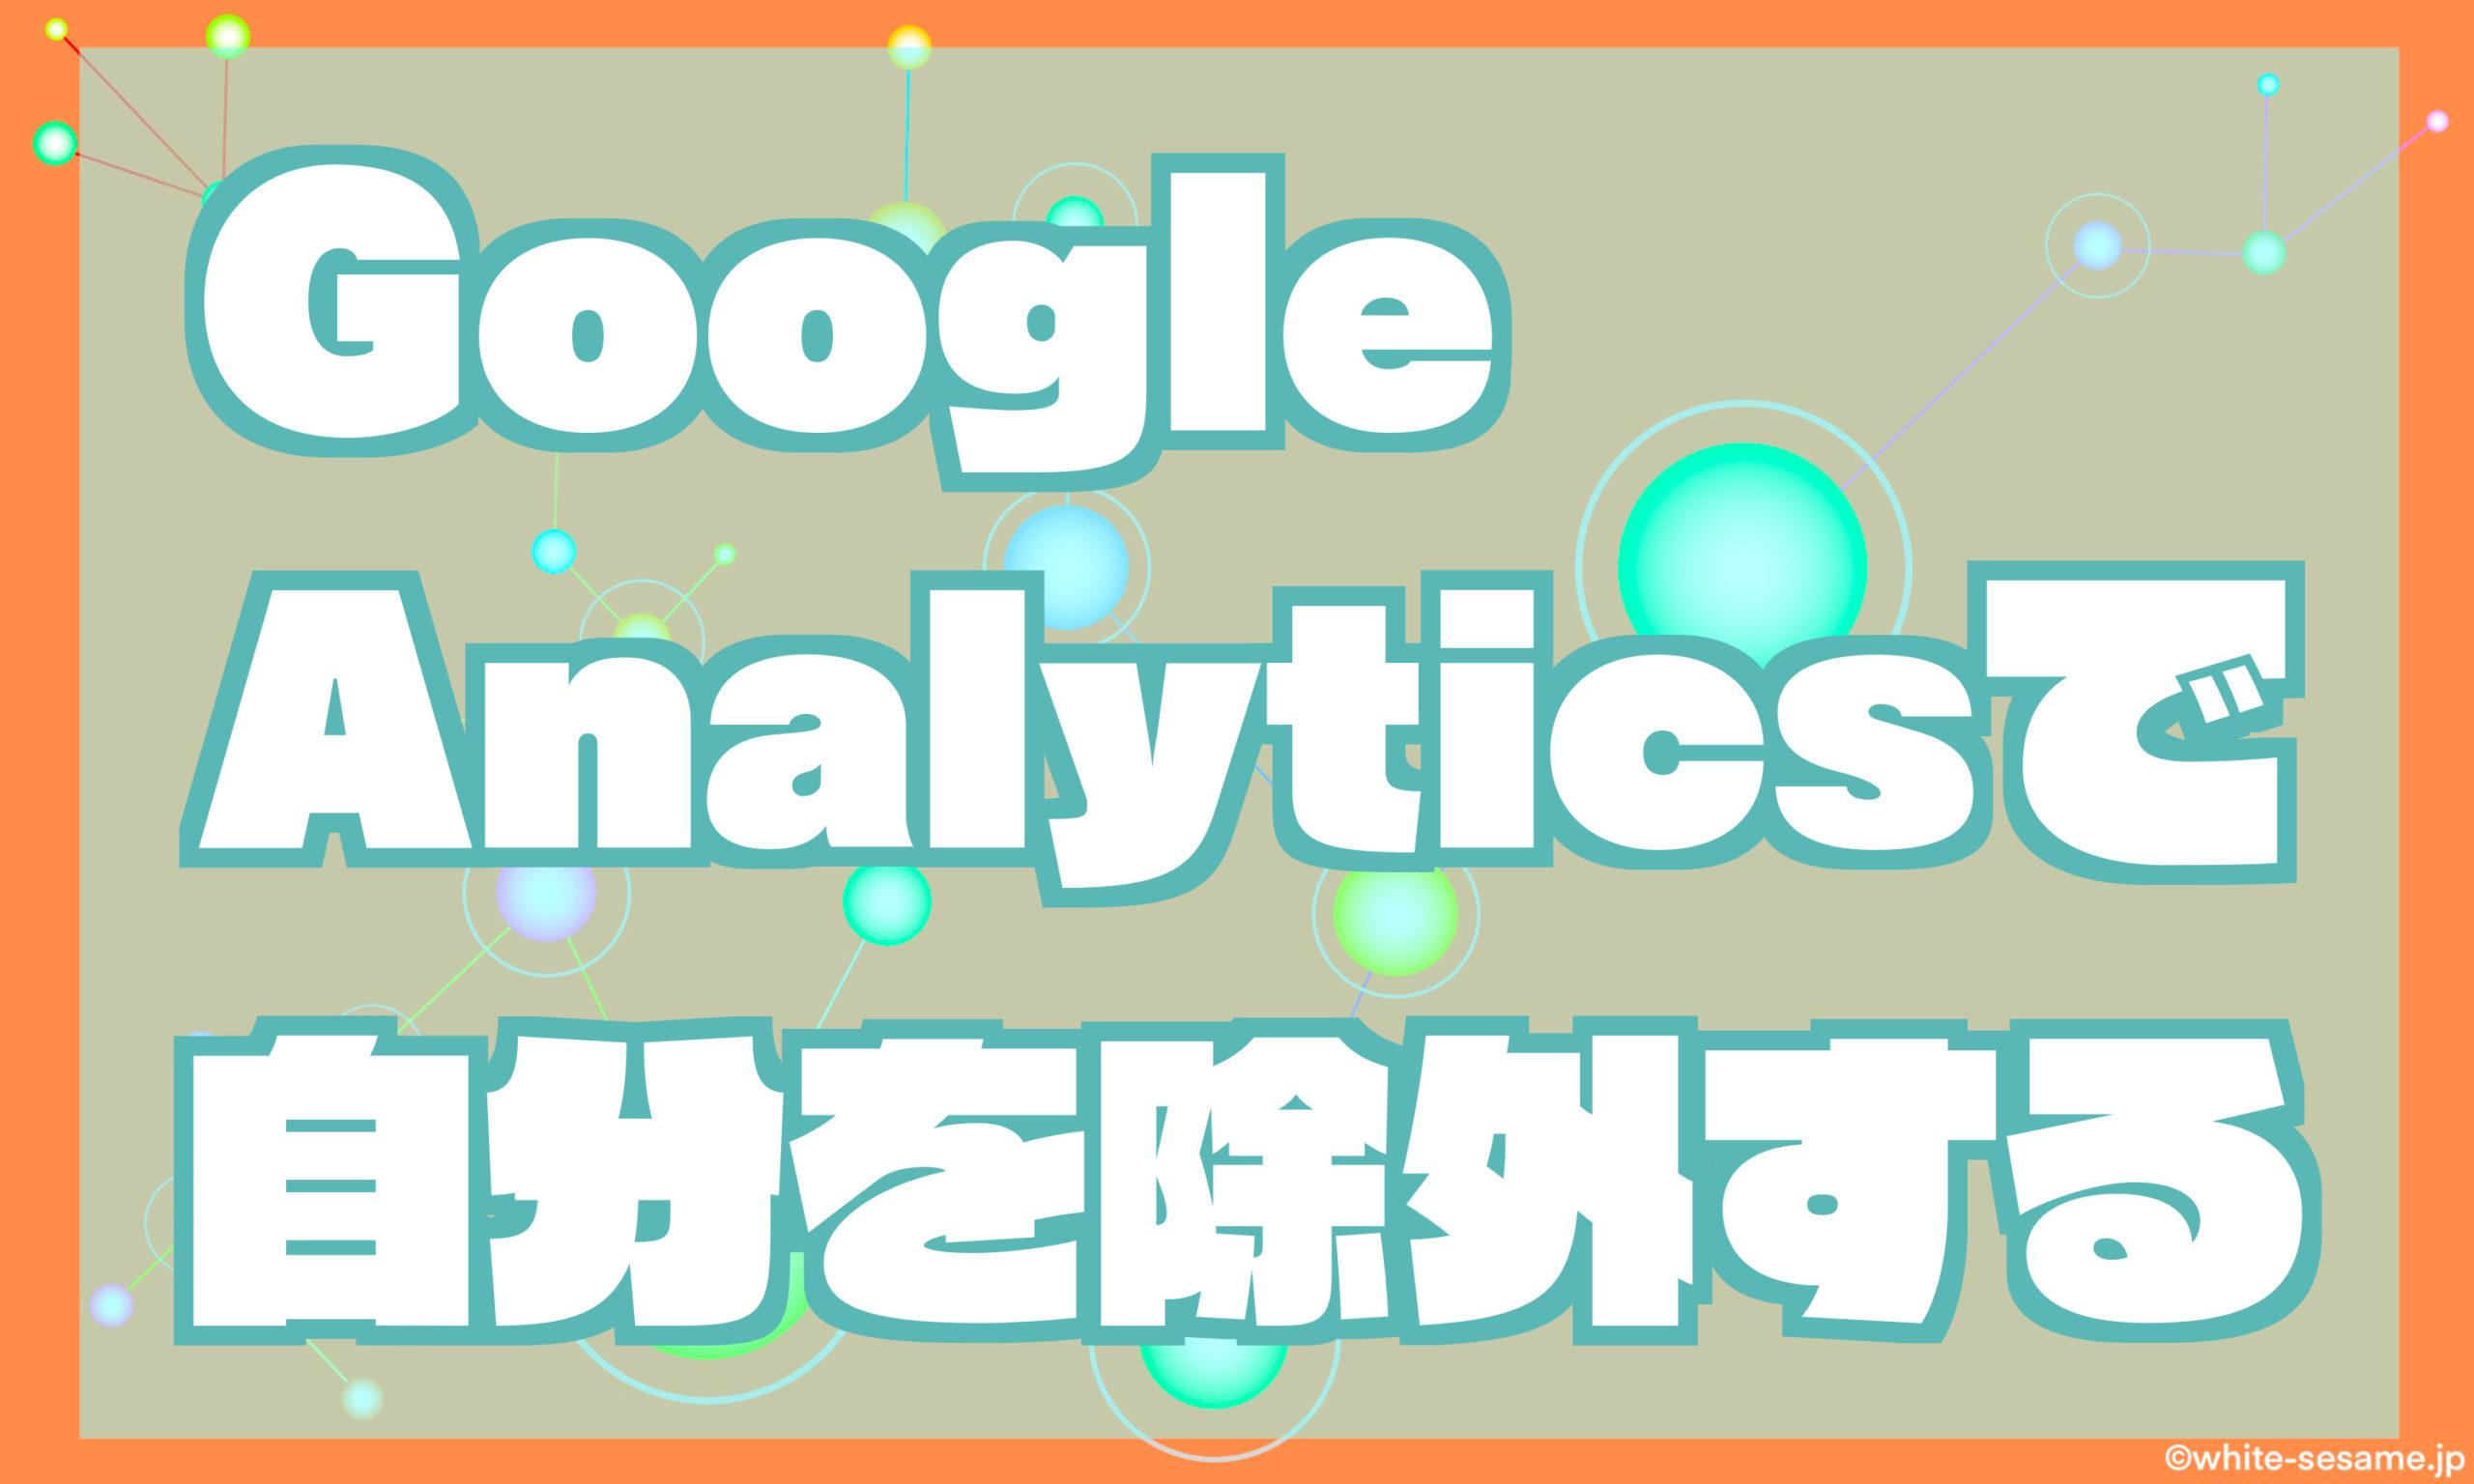 Google Analyticsで自分を除外する方法